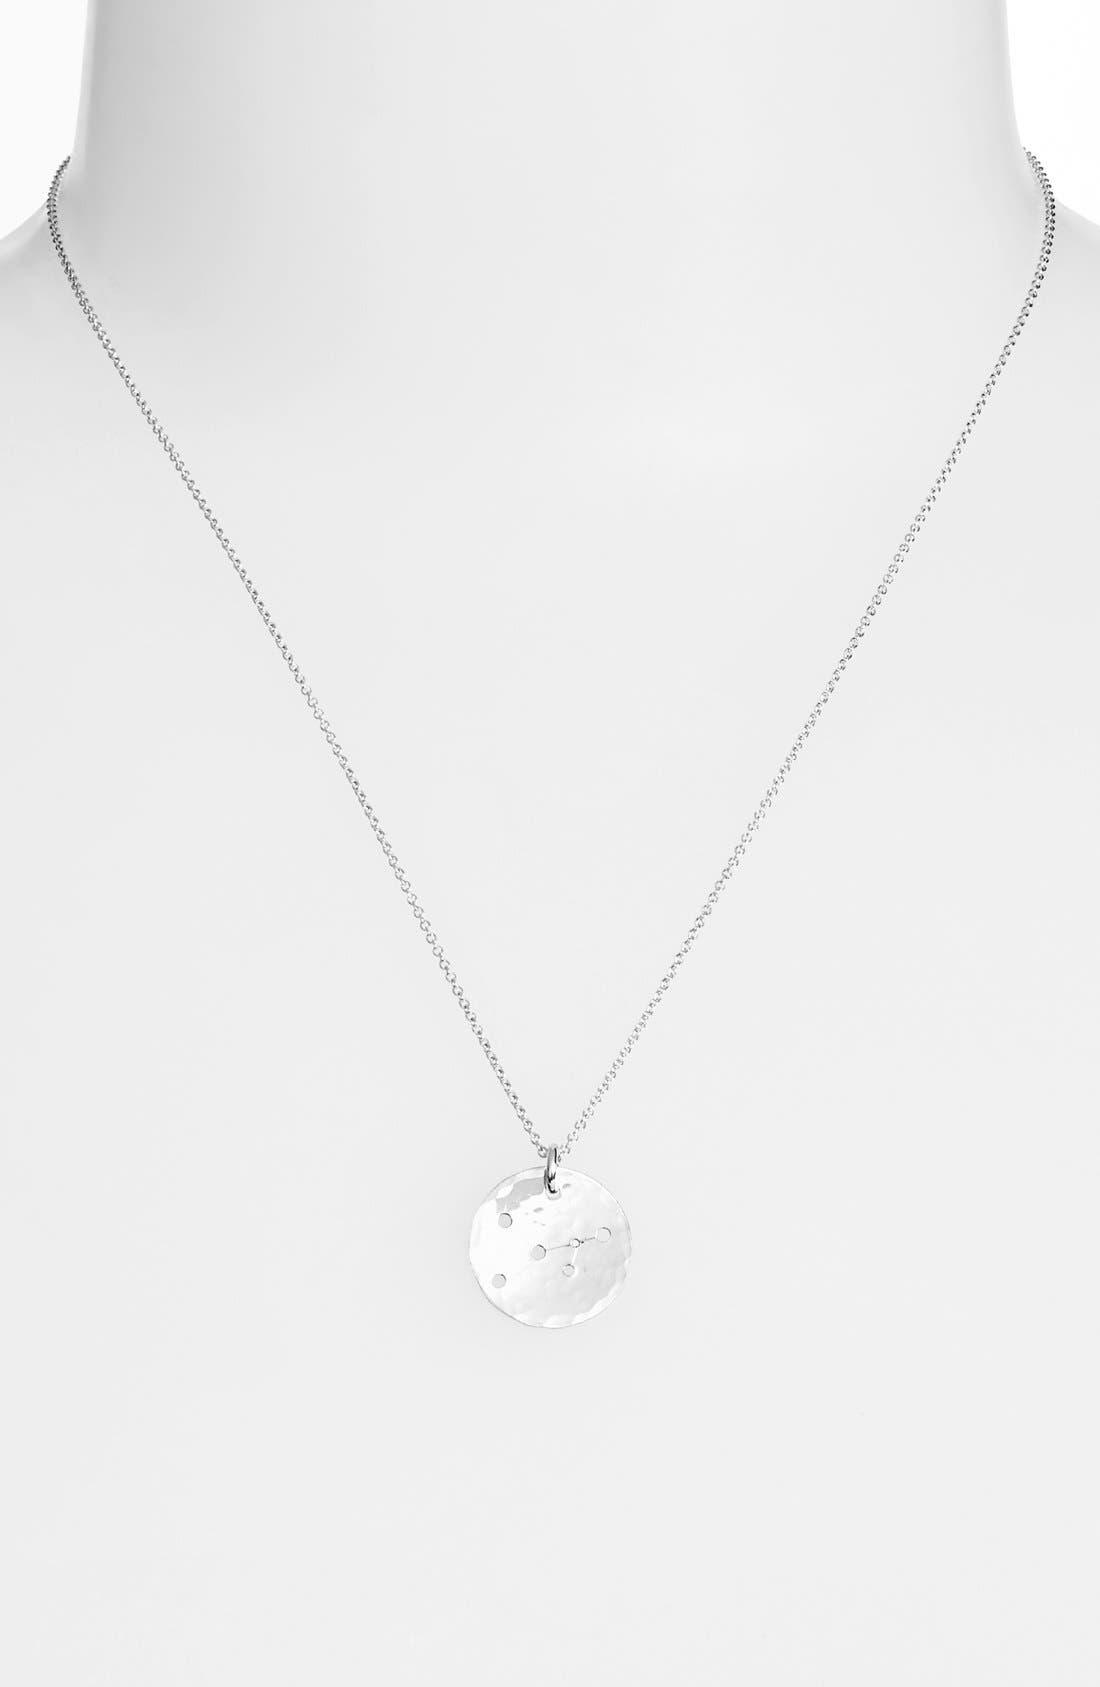 Ija 'Small Zodiac' Sterling Silver Necklace,                             Main thumbnail 4, color,